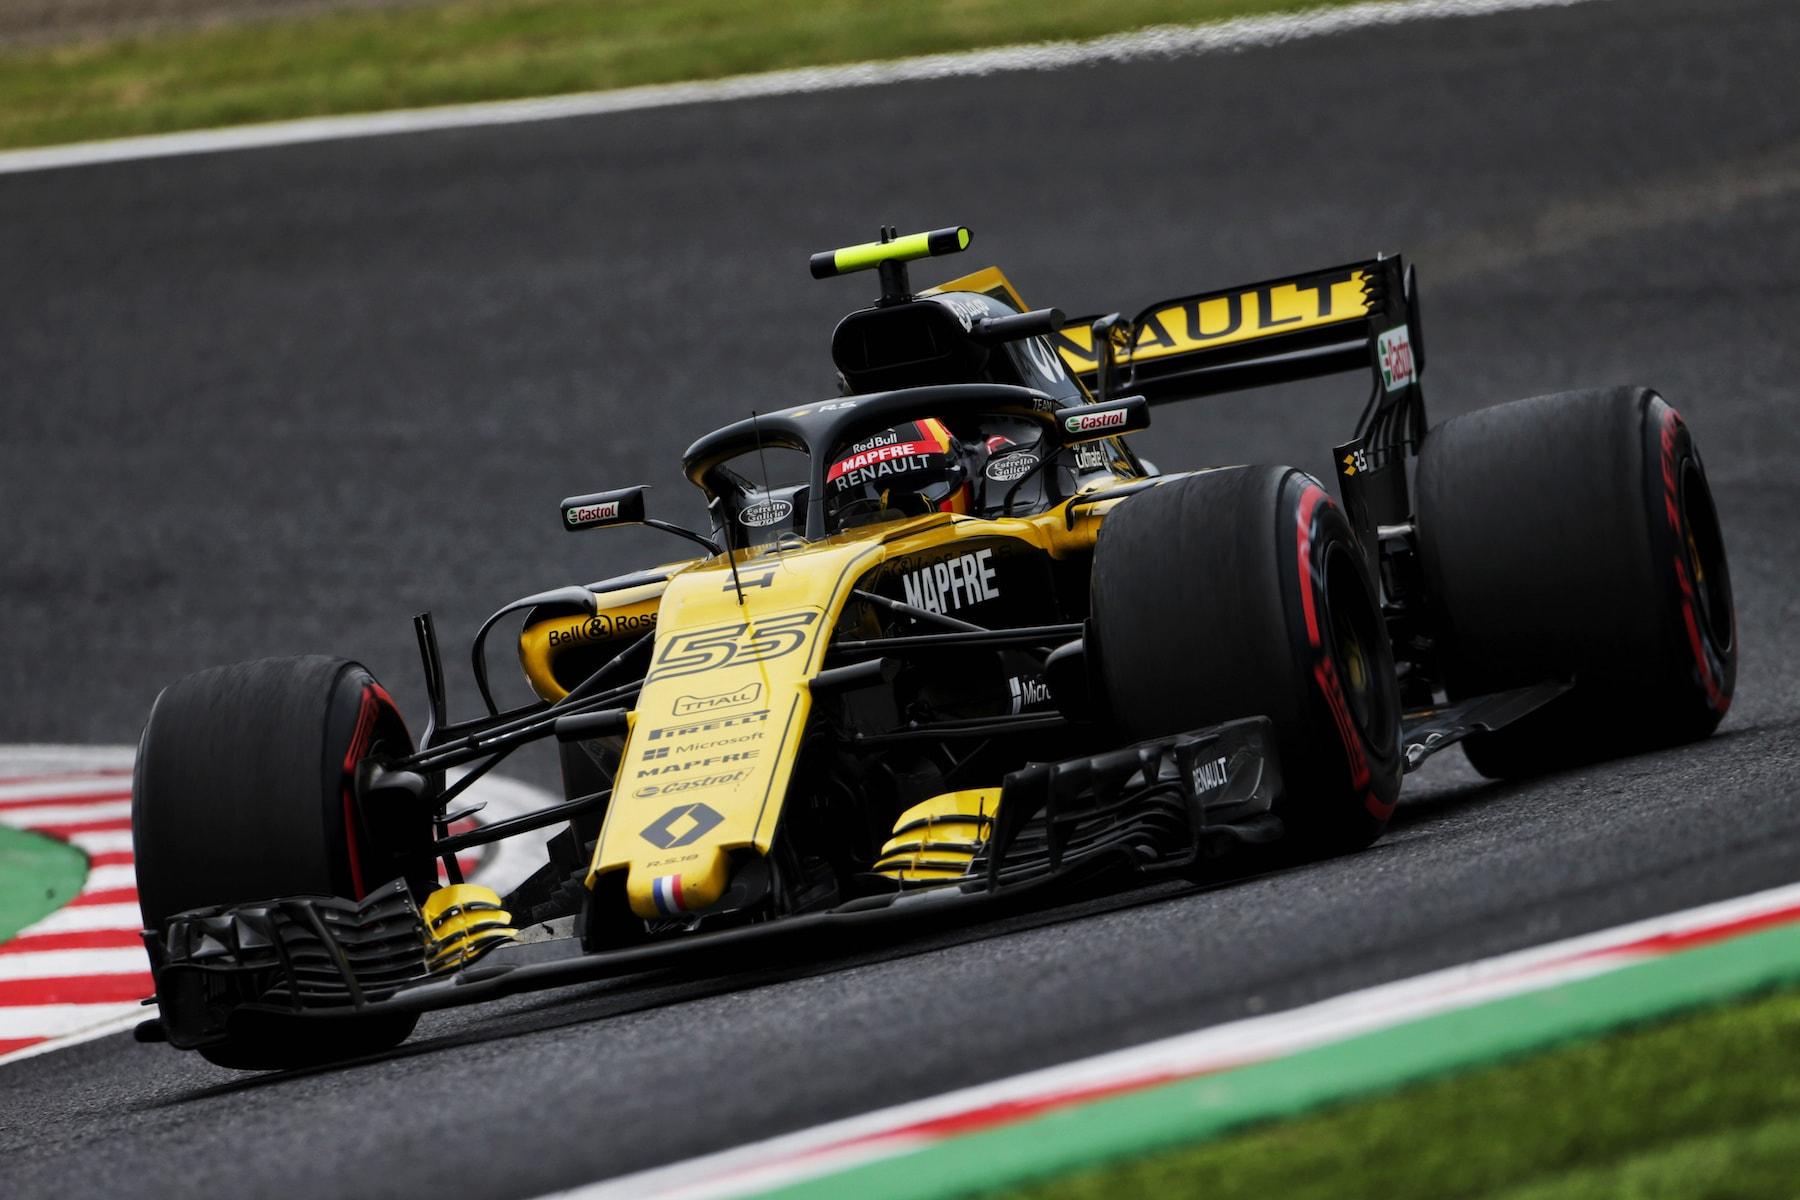 H 2018 Carlos Sainz | Renault RS18 | 2018 Japanese GP 2 copy.jpg